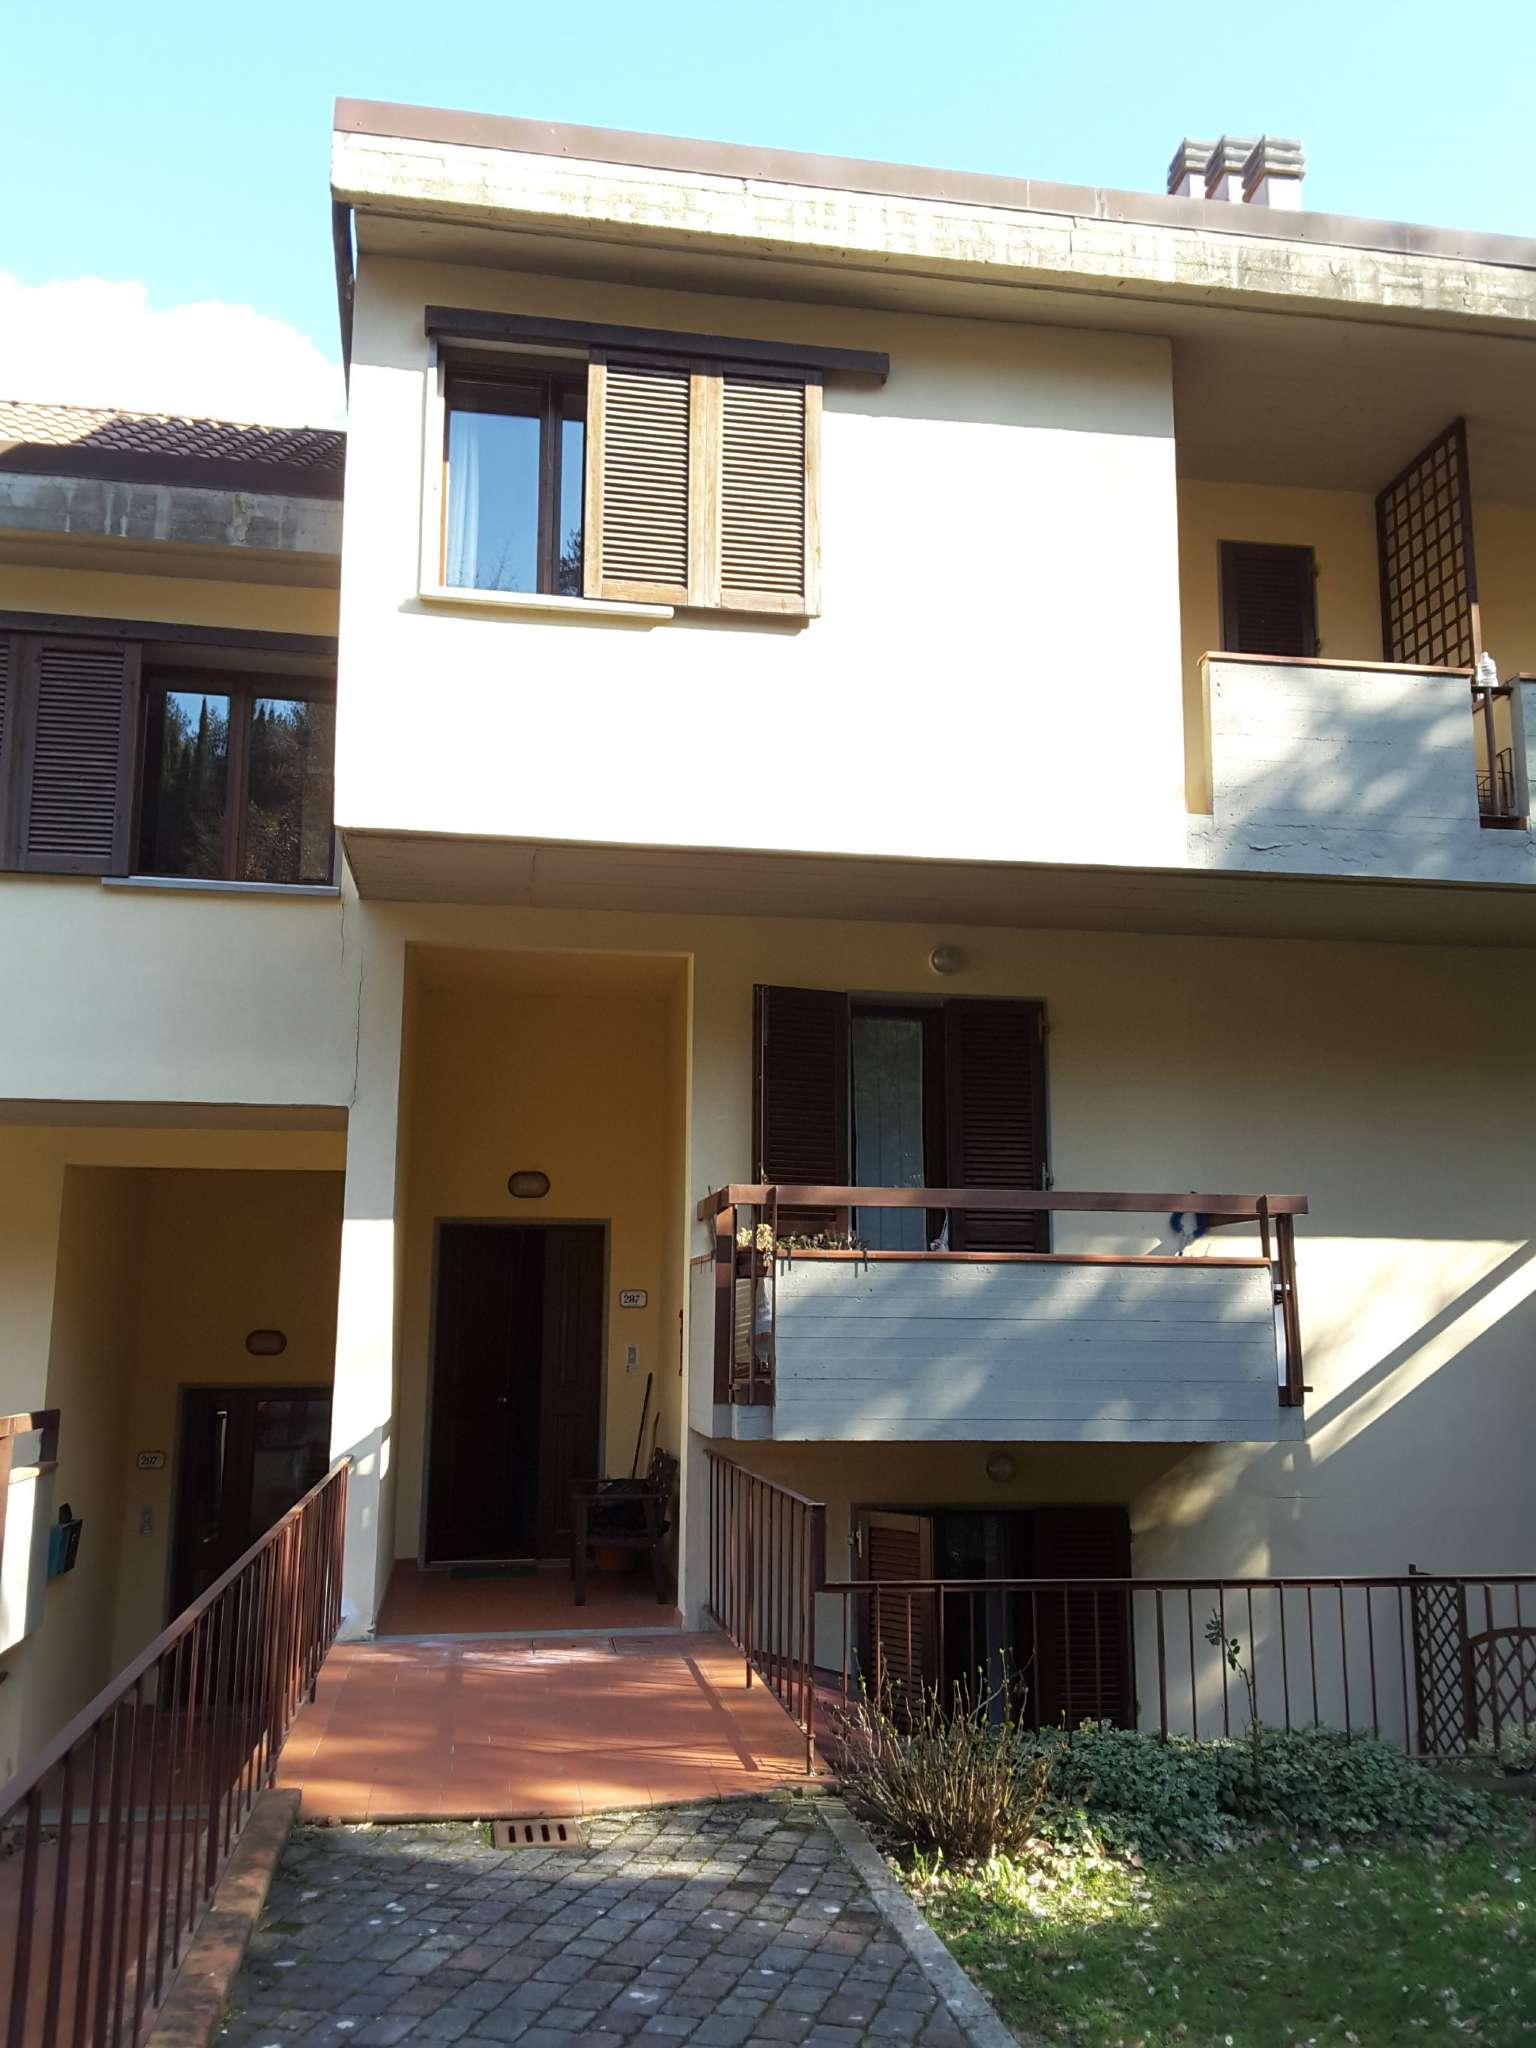 Casa indipendente in Vendita a Vaglia Periferia: 5 locali, 140 mq